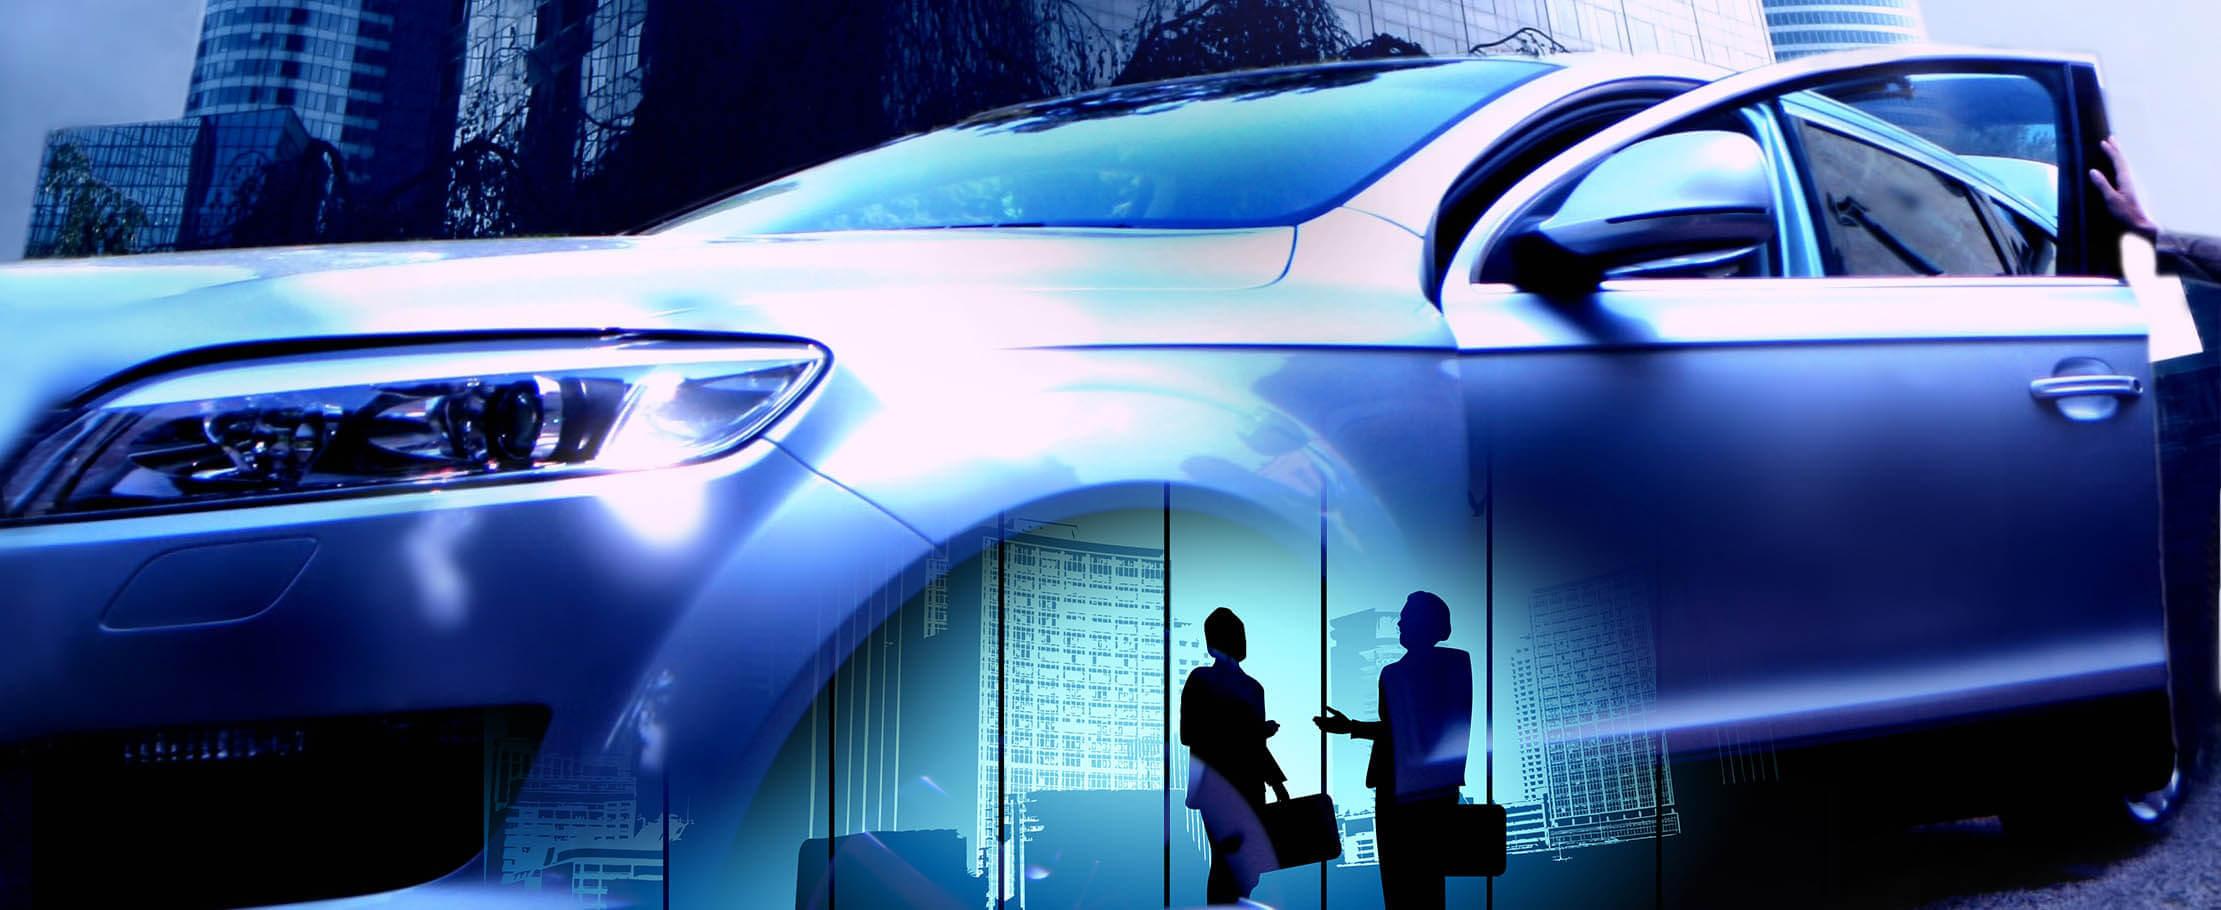 Taxi Transfer per viaggi d'affari